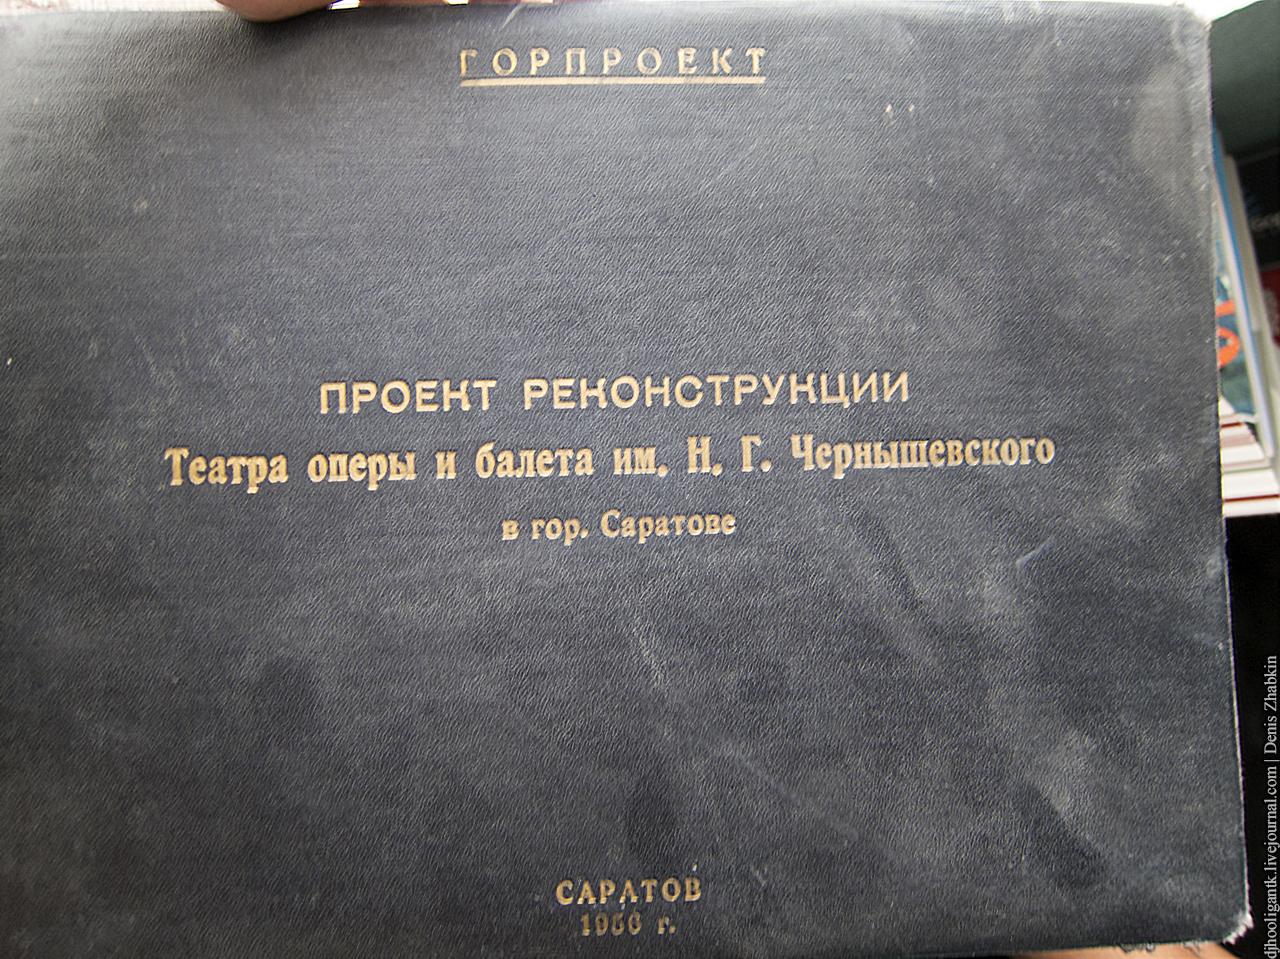 Театр оперы и балета Саратов проект